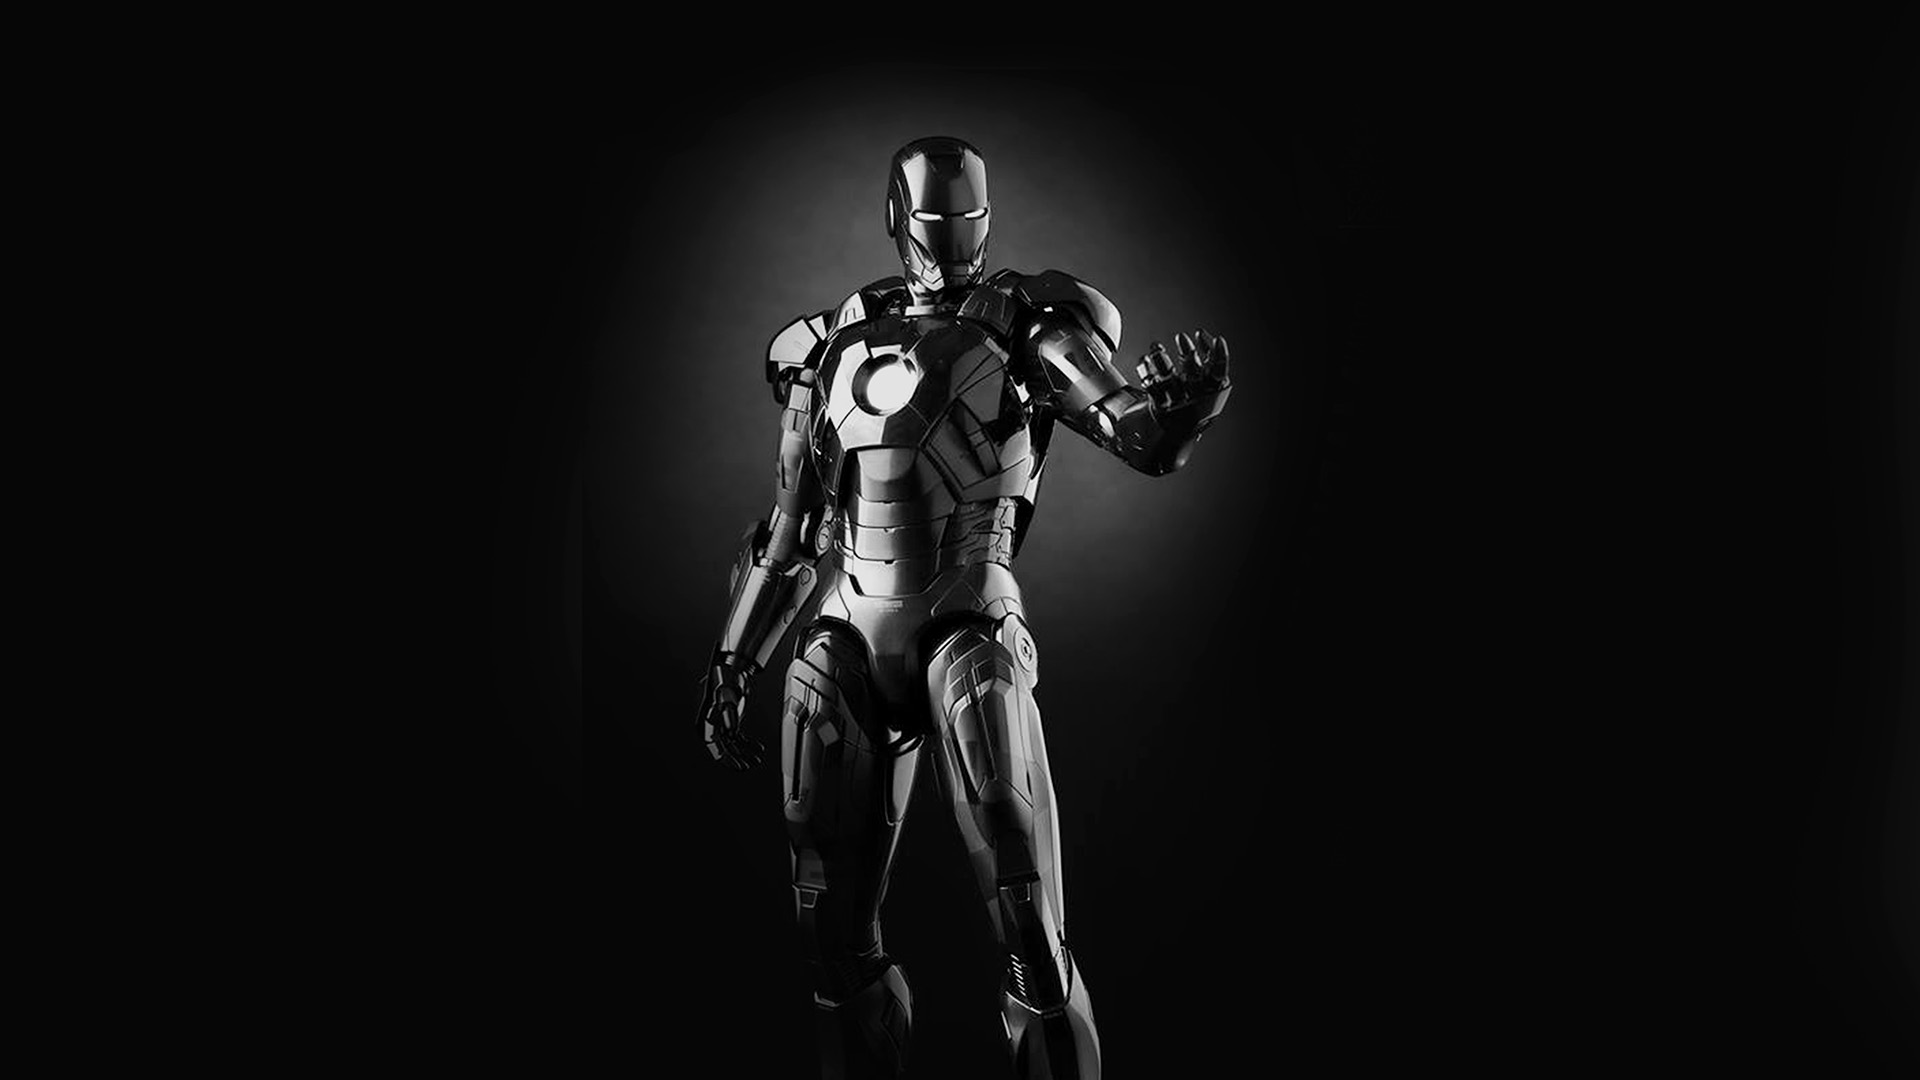 am00-ironman-dark-figure-hero-art-avengers-bw-wallpaper